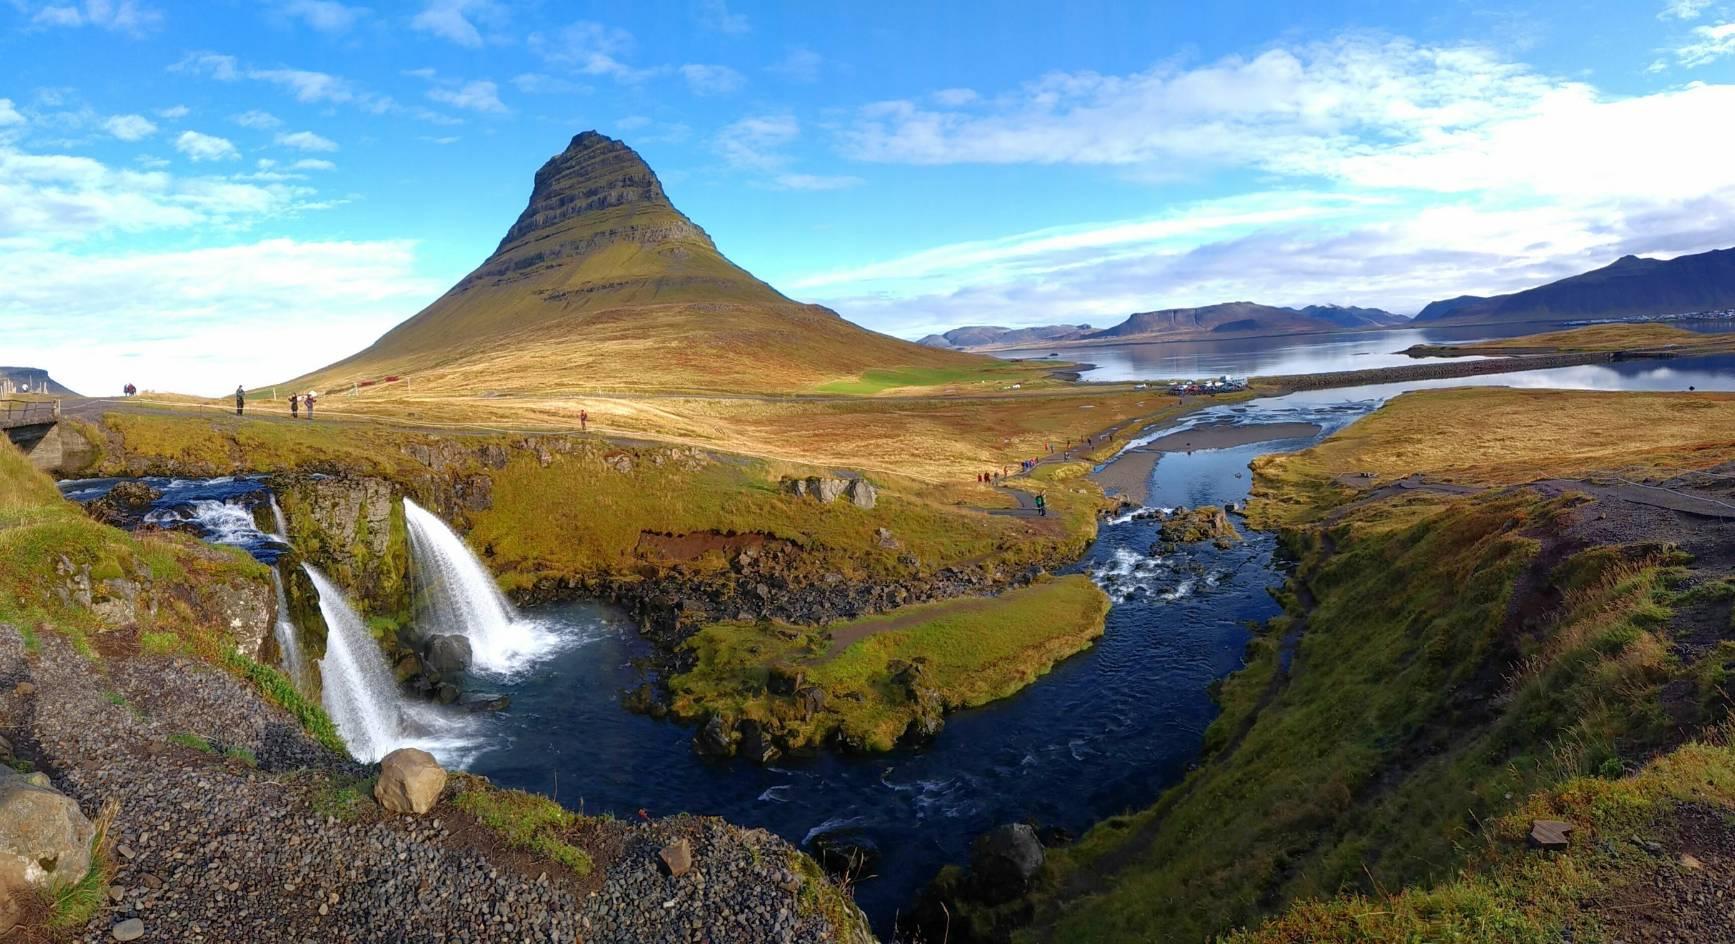 15 Facts about Iceland-15 สิ่งควรรู้ก่อนไปเที่ยวไอซ์แลนด์